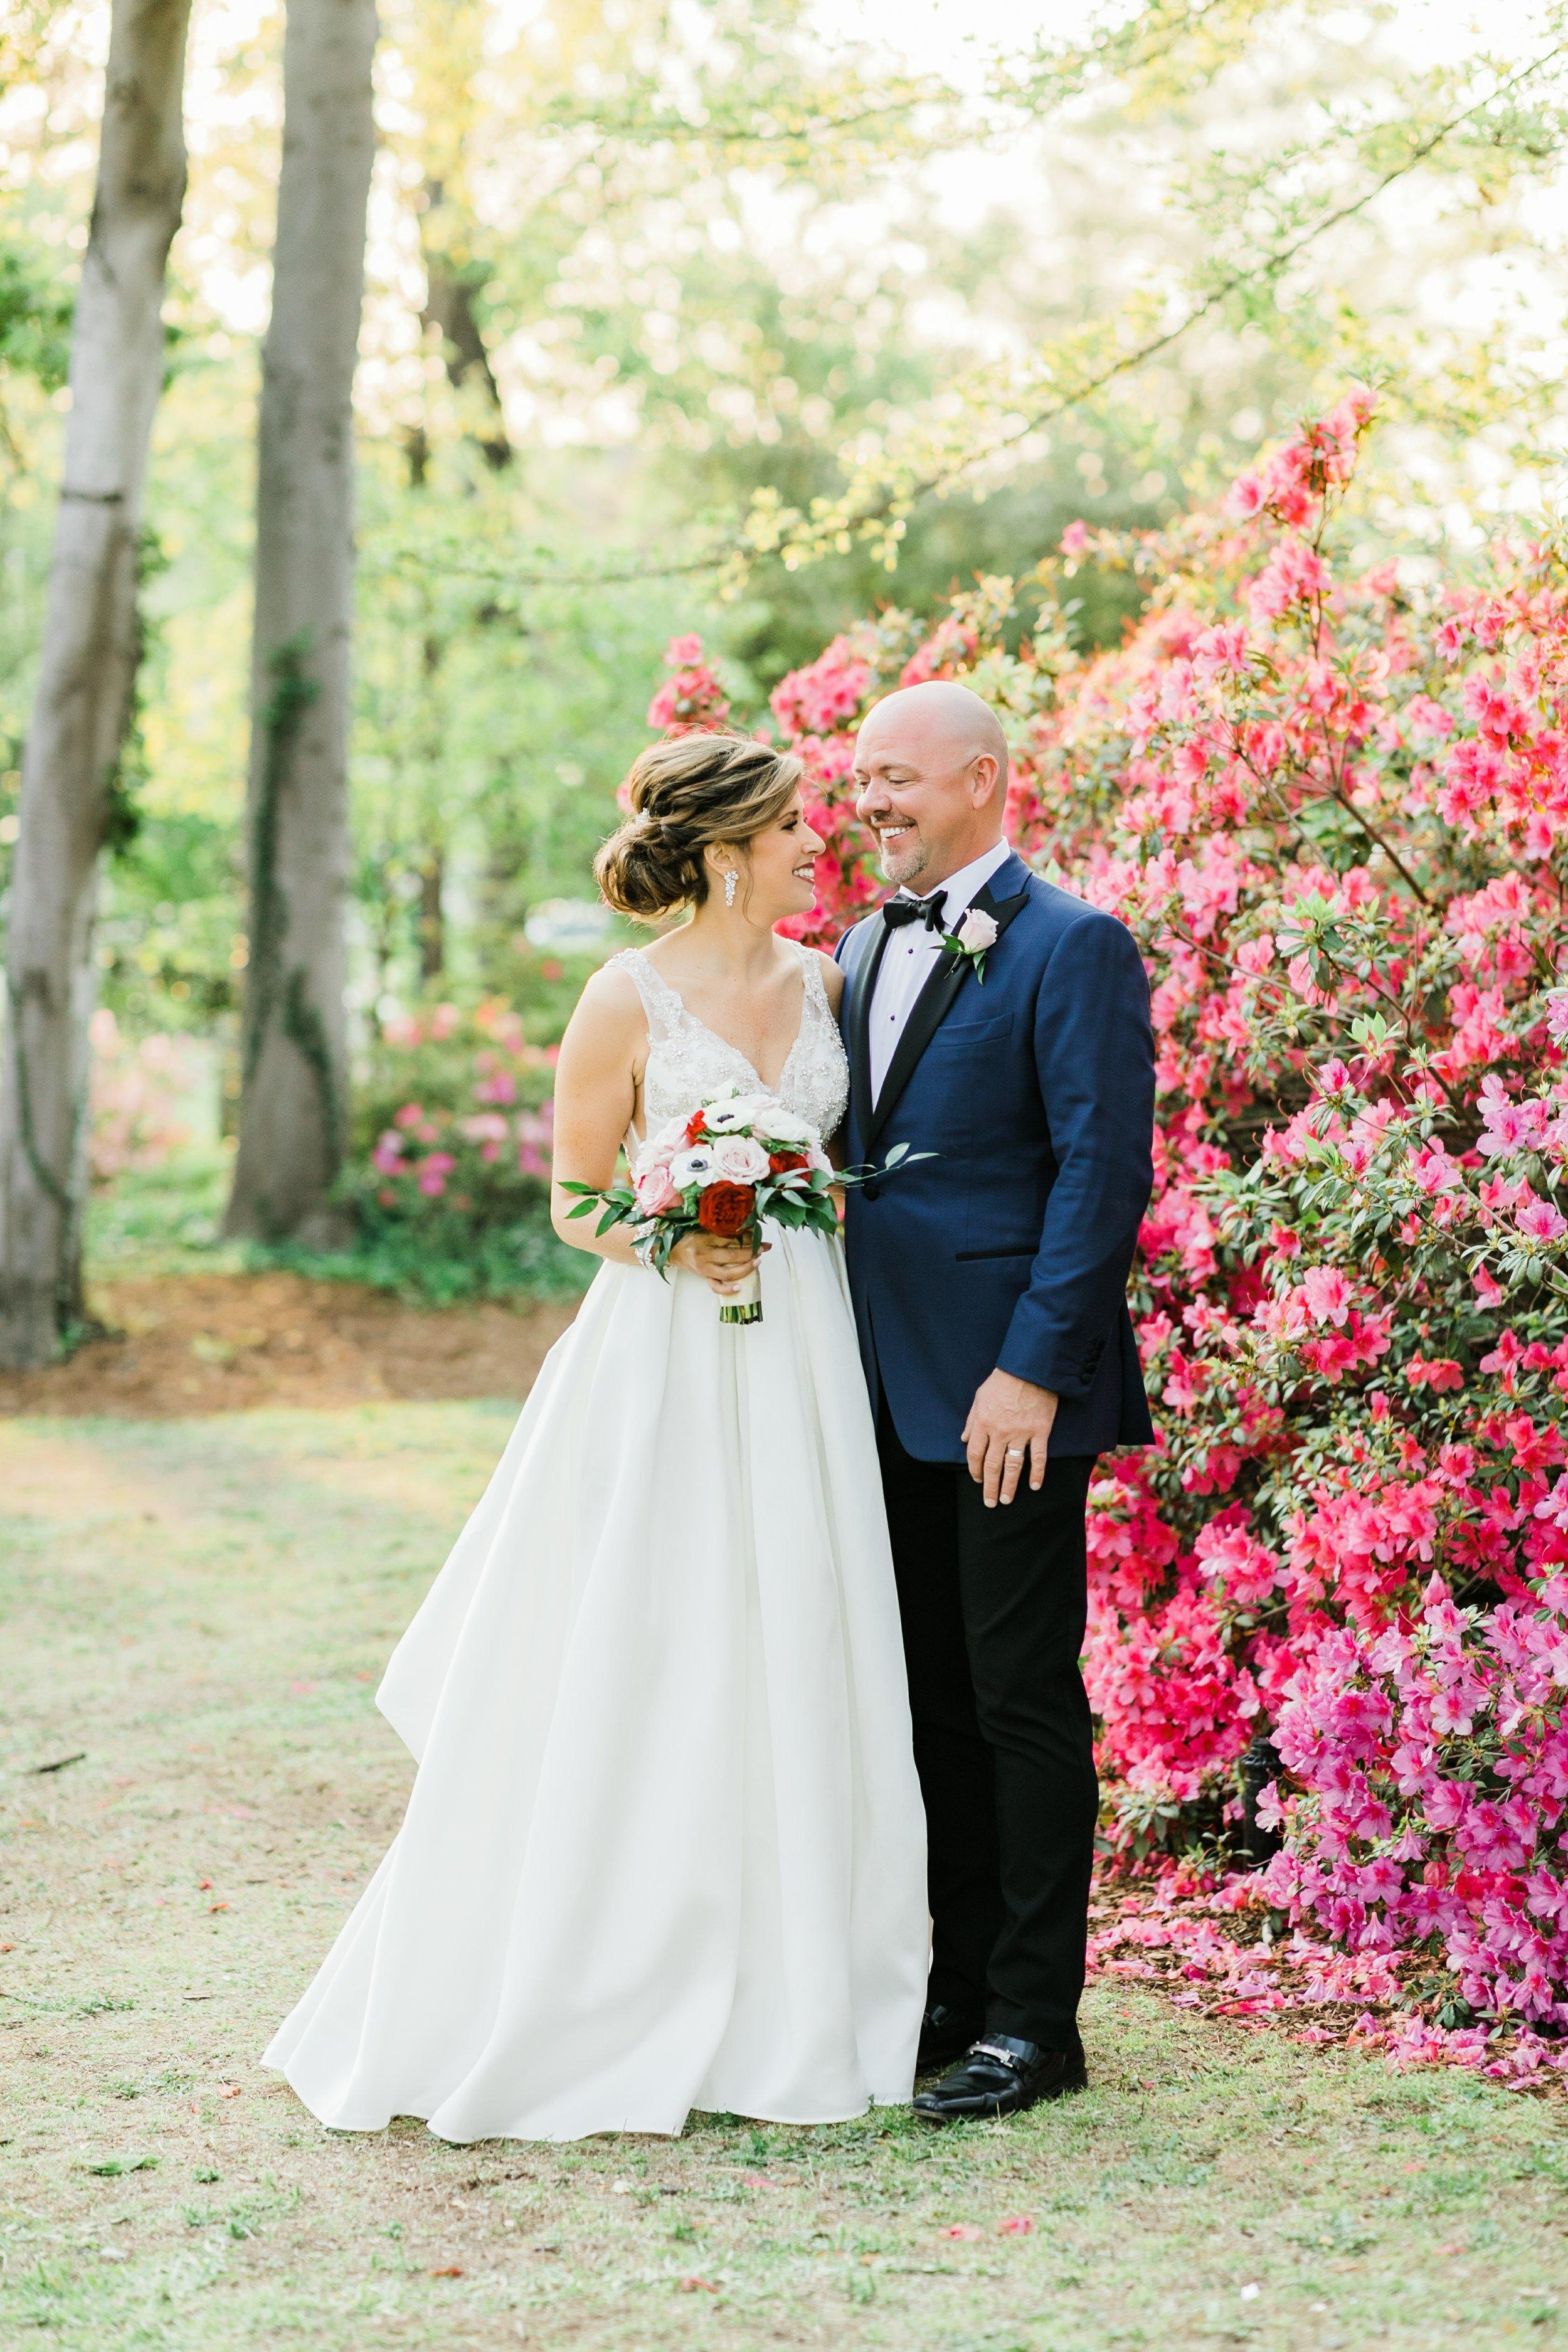 haehn-wedding-little-chapel-in-the-woods-denton-tx-lantana-golf-club-wedding-040.jpg